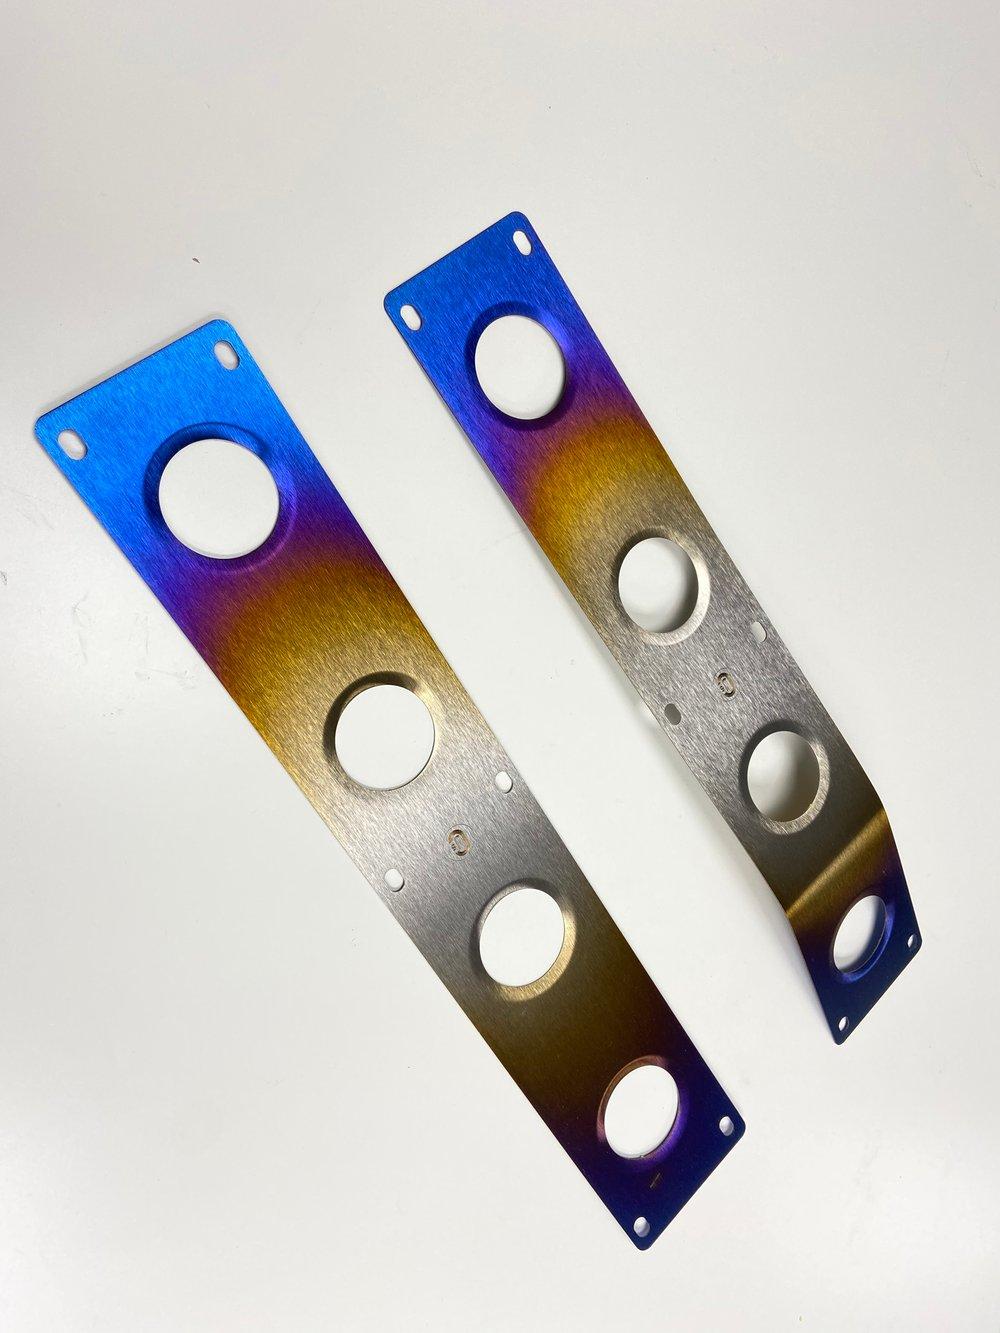 Nissan S13/S14/S15 SR20DET Titanium engine coil pack cover